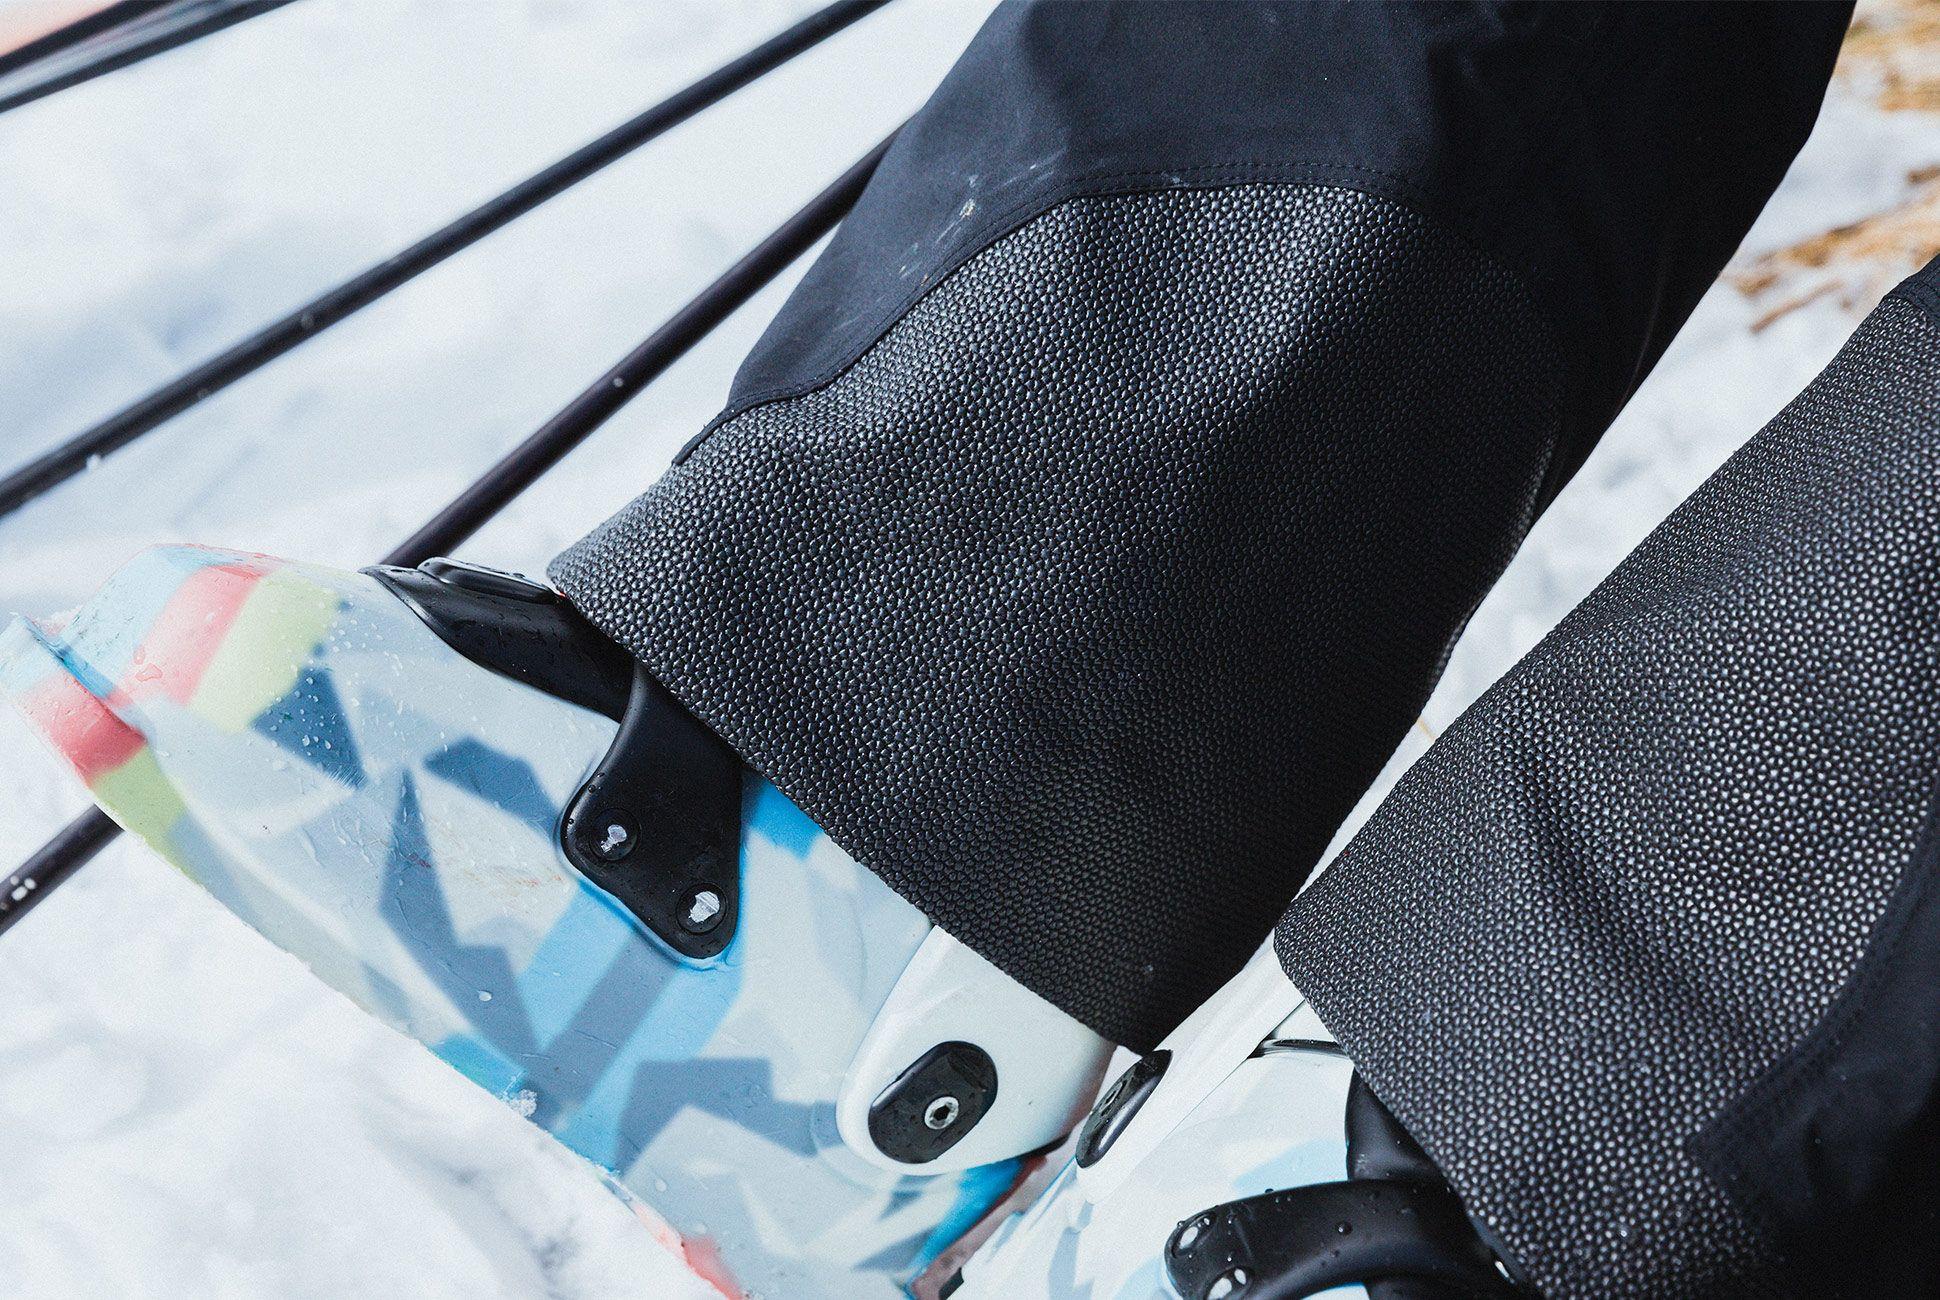 ultimate-ski-and-snow-gear-patrol-trew-slide-6